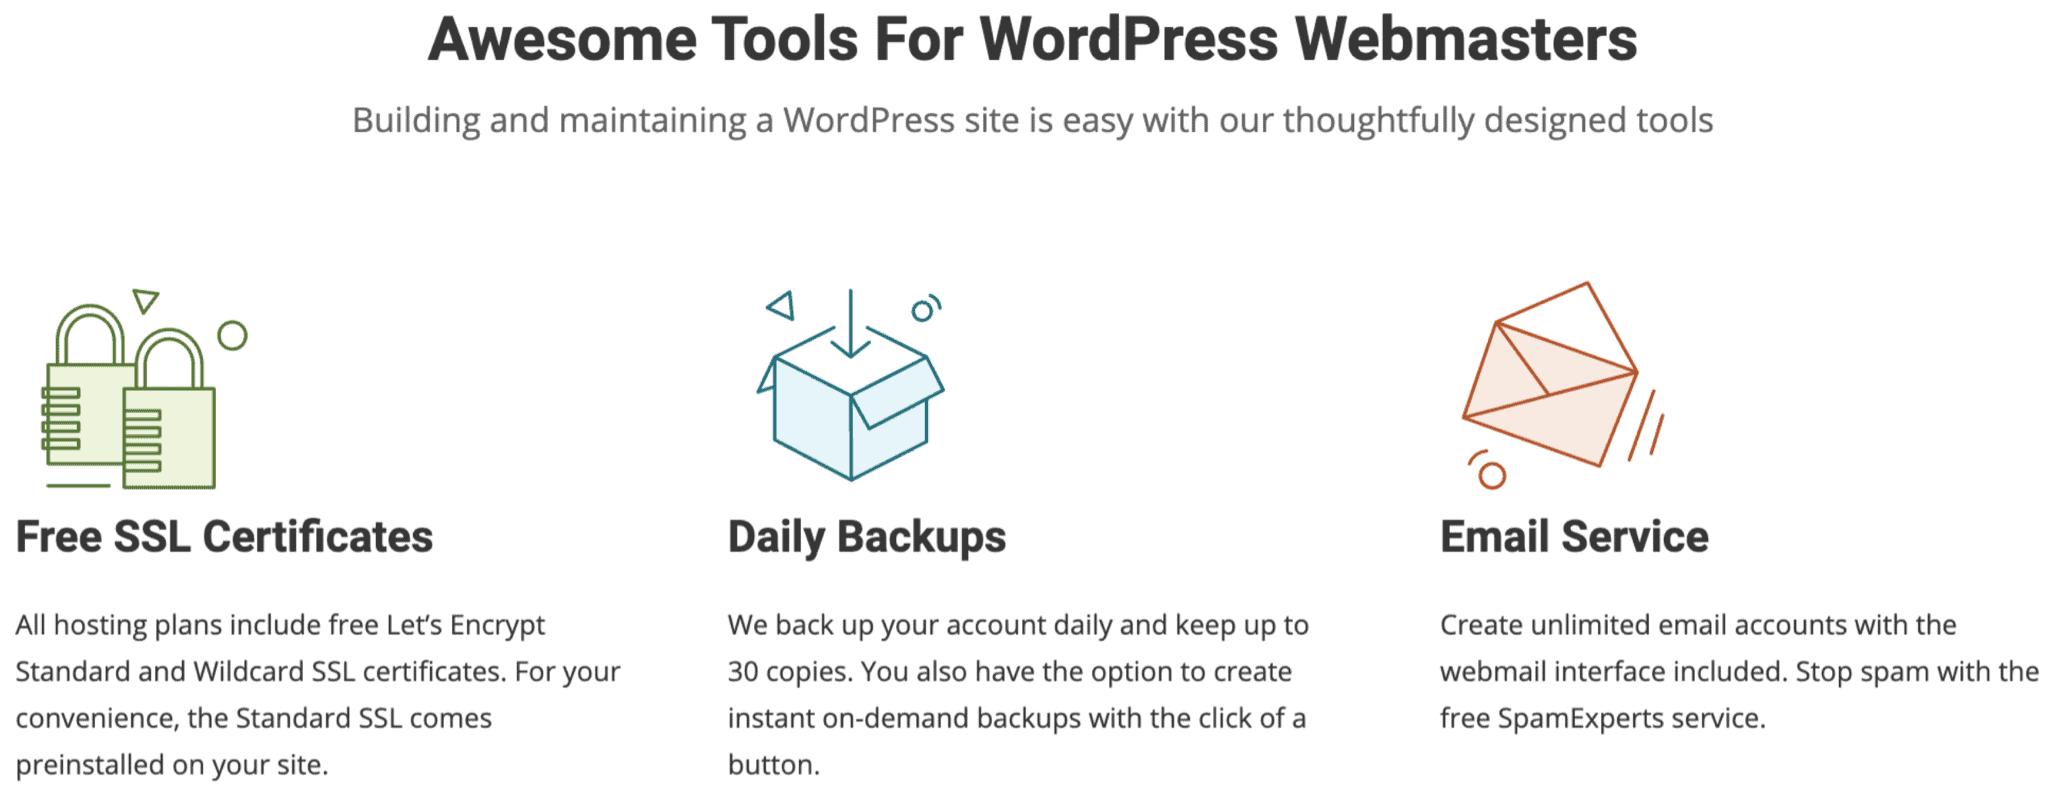 siteground-wordpress-hosting-webmaster-tools